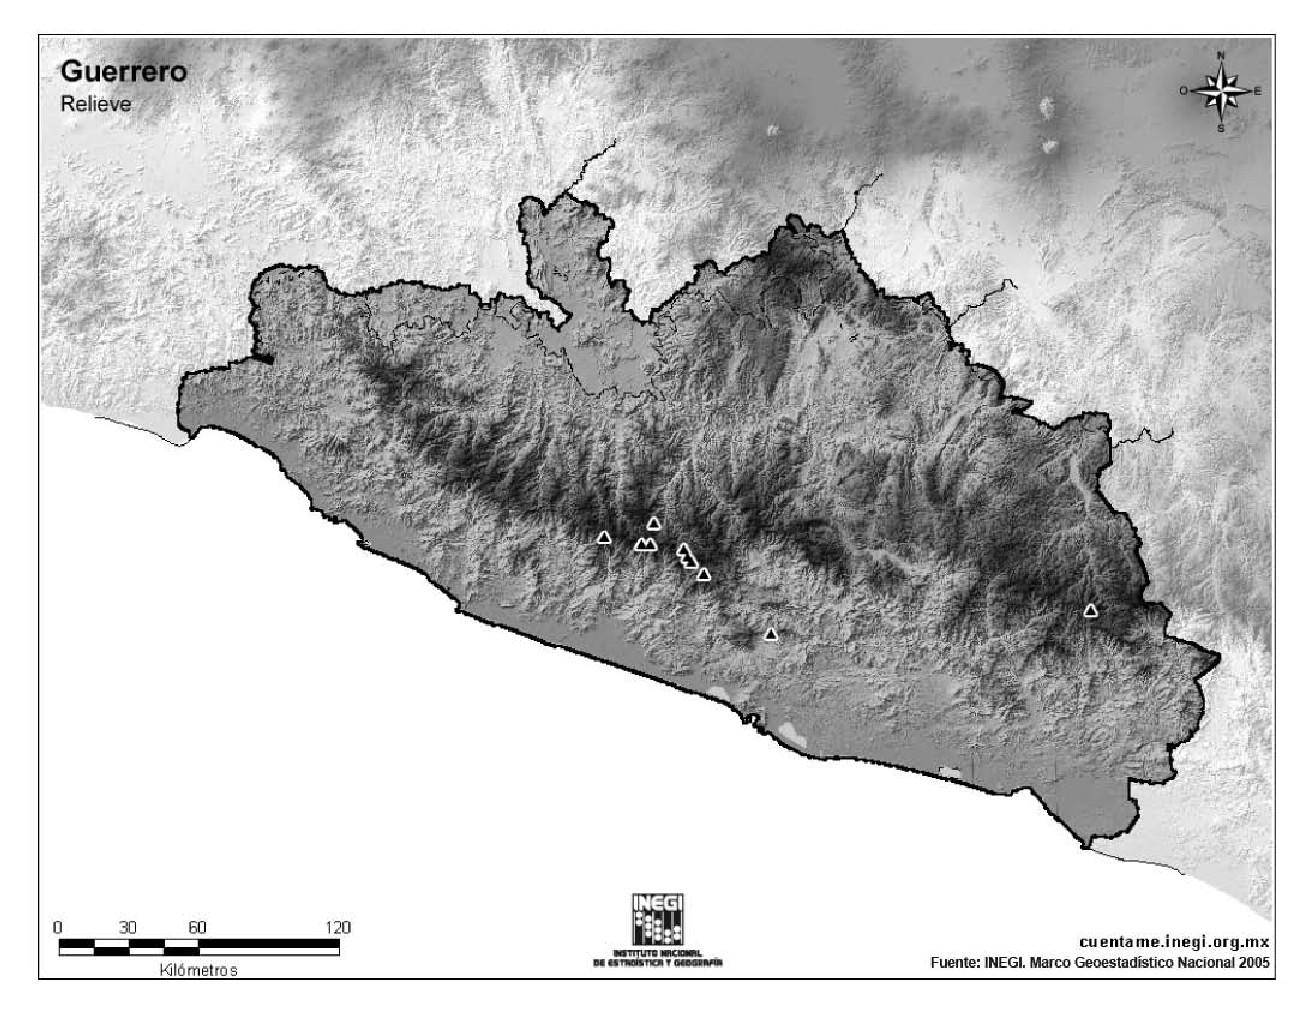 Mapa mudo de montañas de Guerrero. INEGI de México